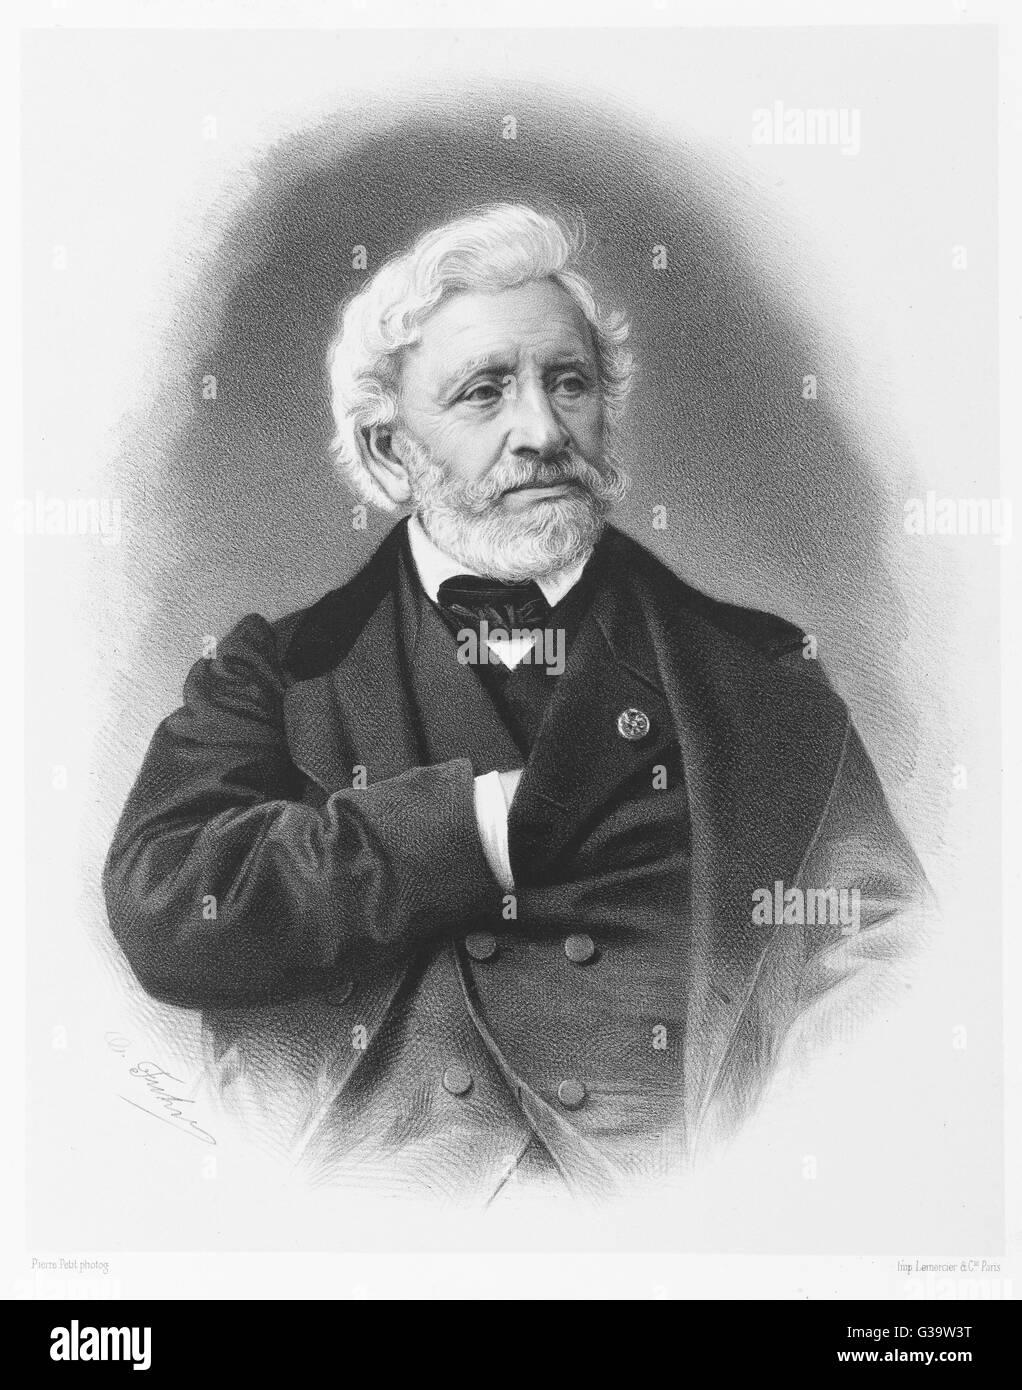 FRANCOIS FORSTER  Swiss engraver        Date: 1790 - 1872 - Stock Image